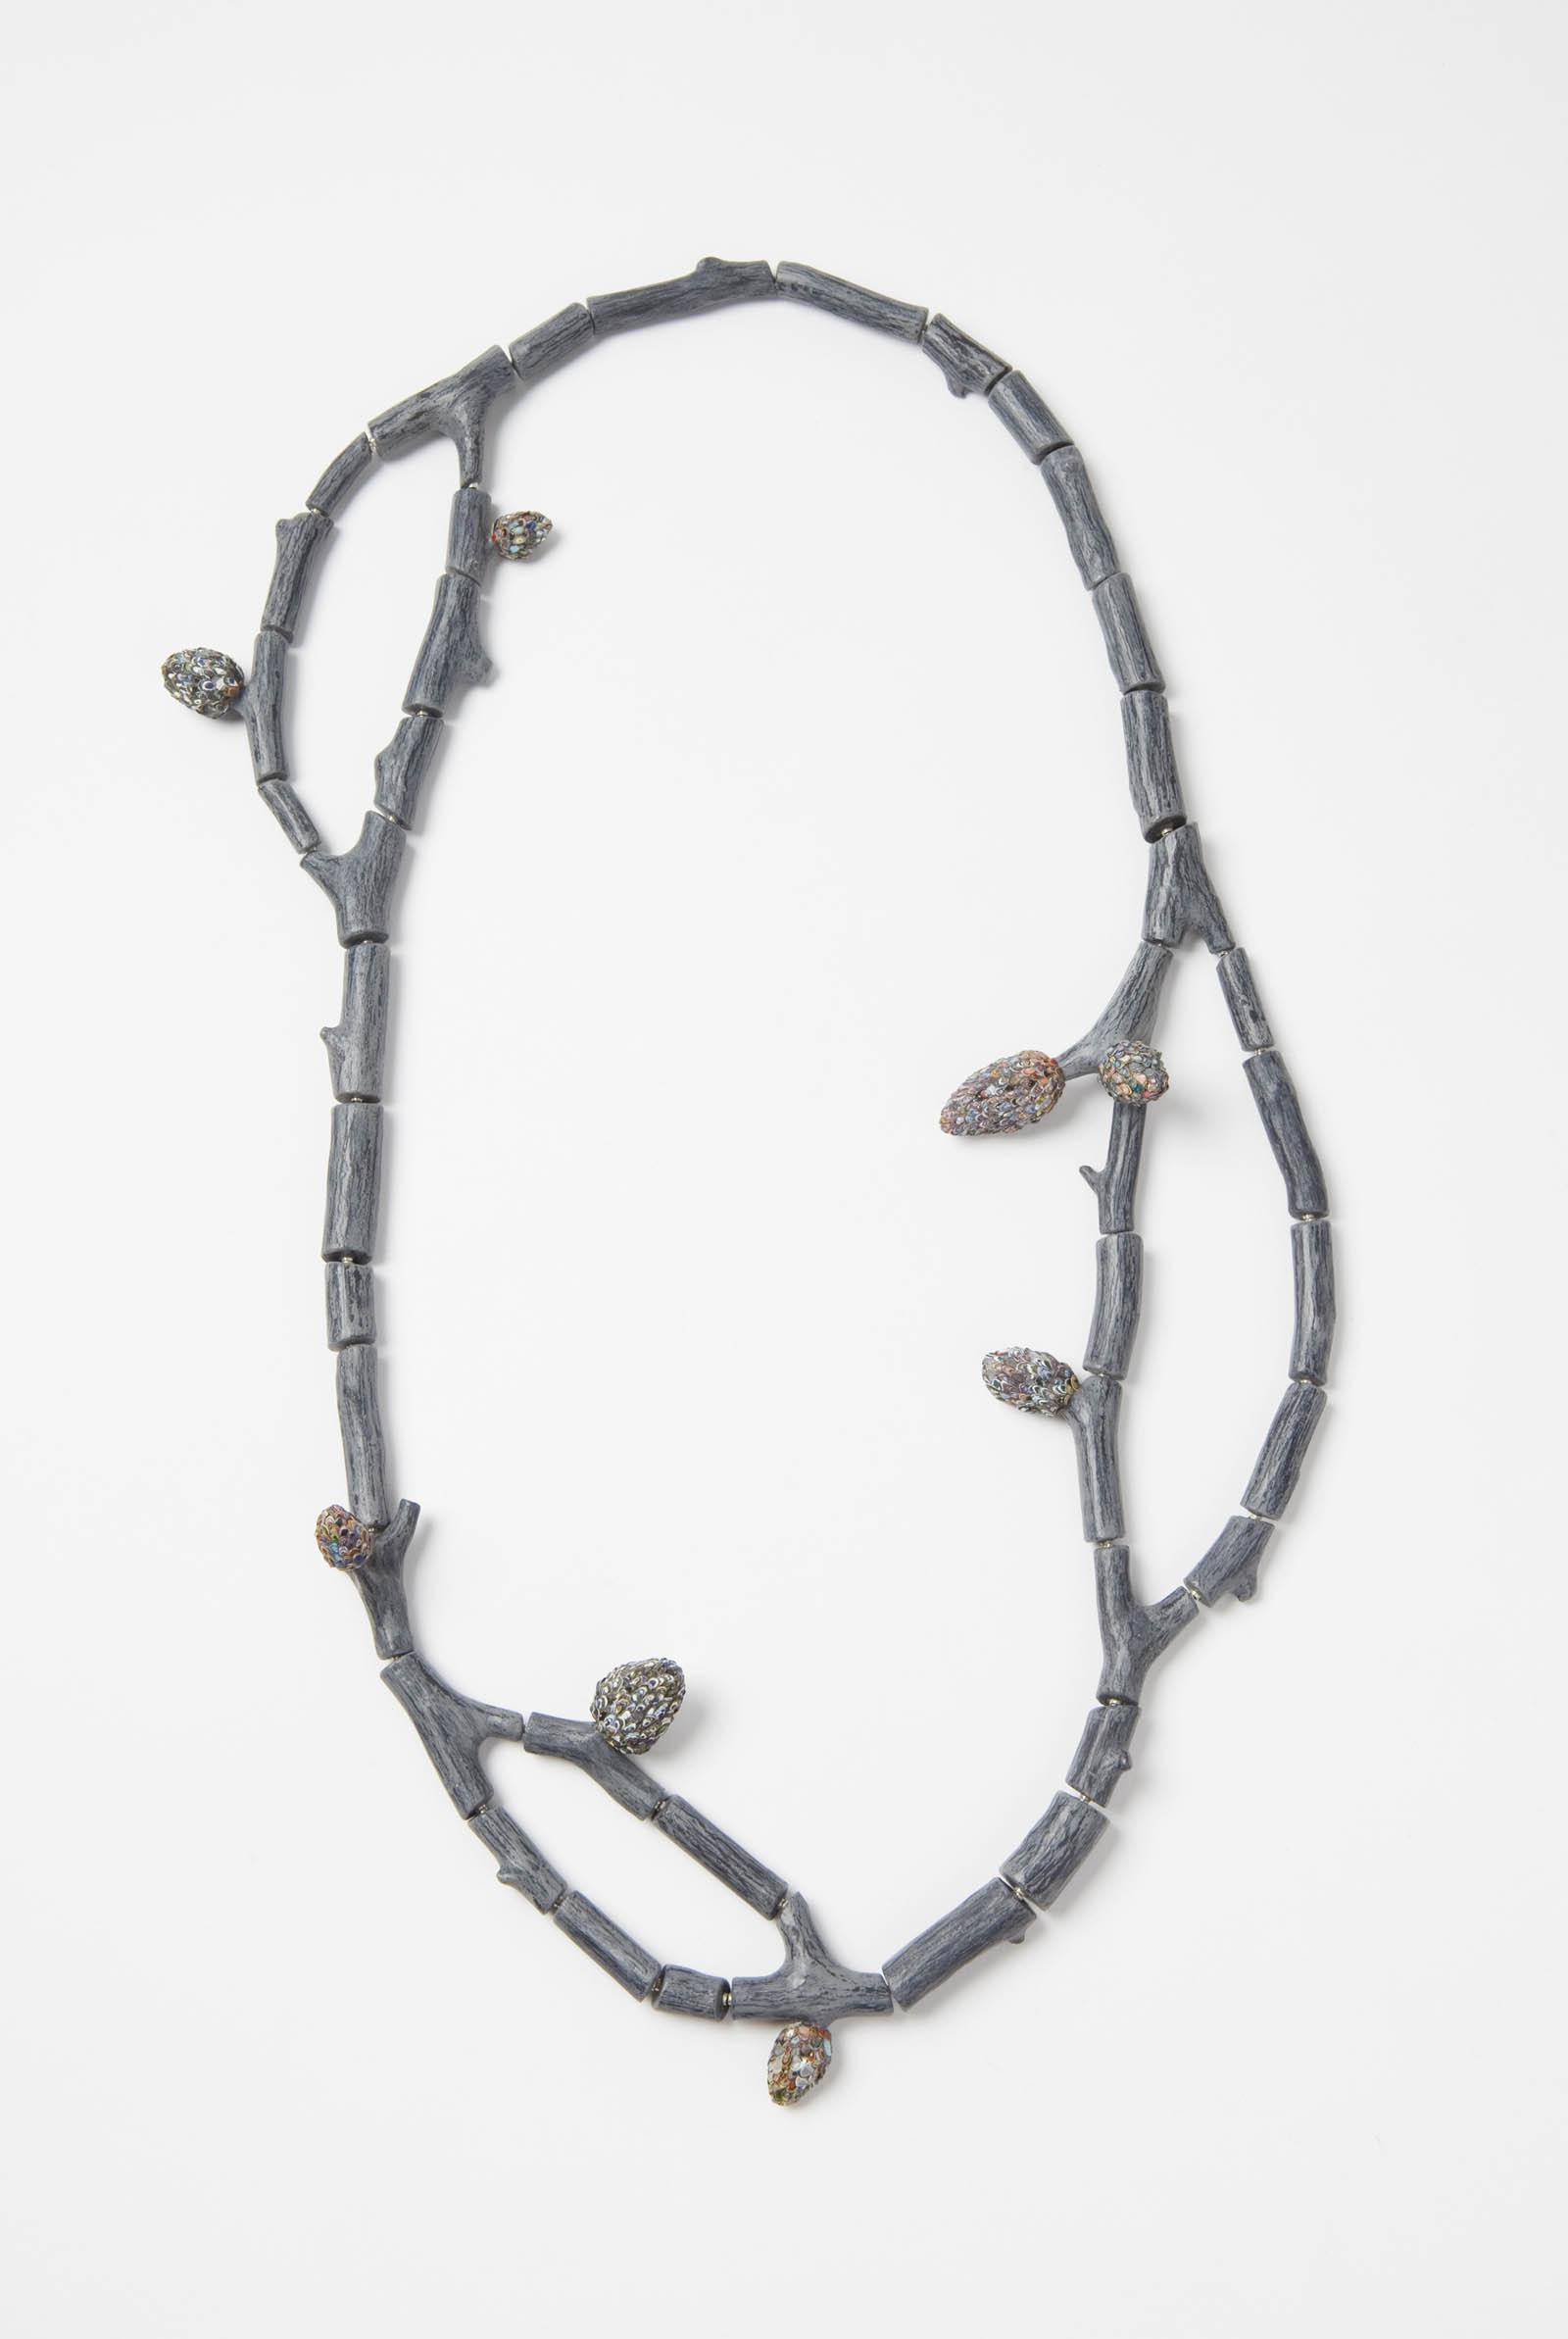 """Raduga Buds 2"" I Necklace, 2013 I Wood, graffiti, silver, steel wire, paint I Photo: Mirei Takeuchi"